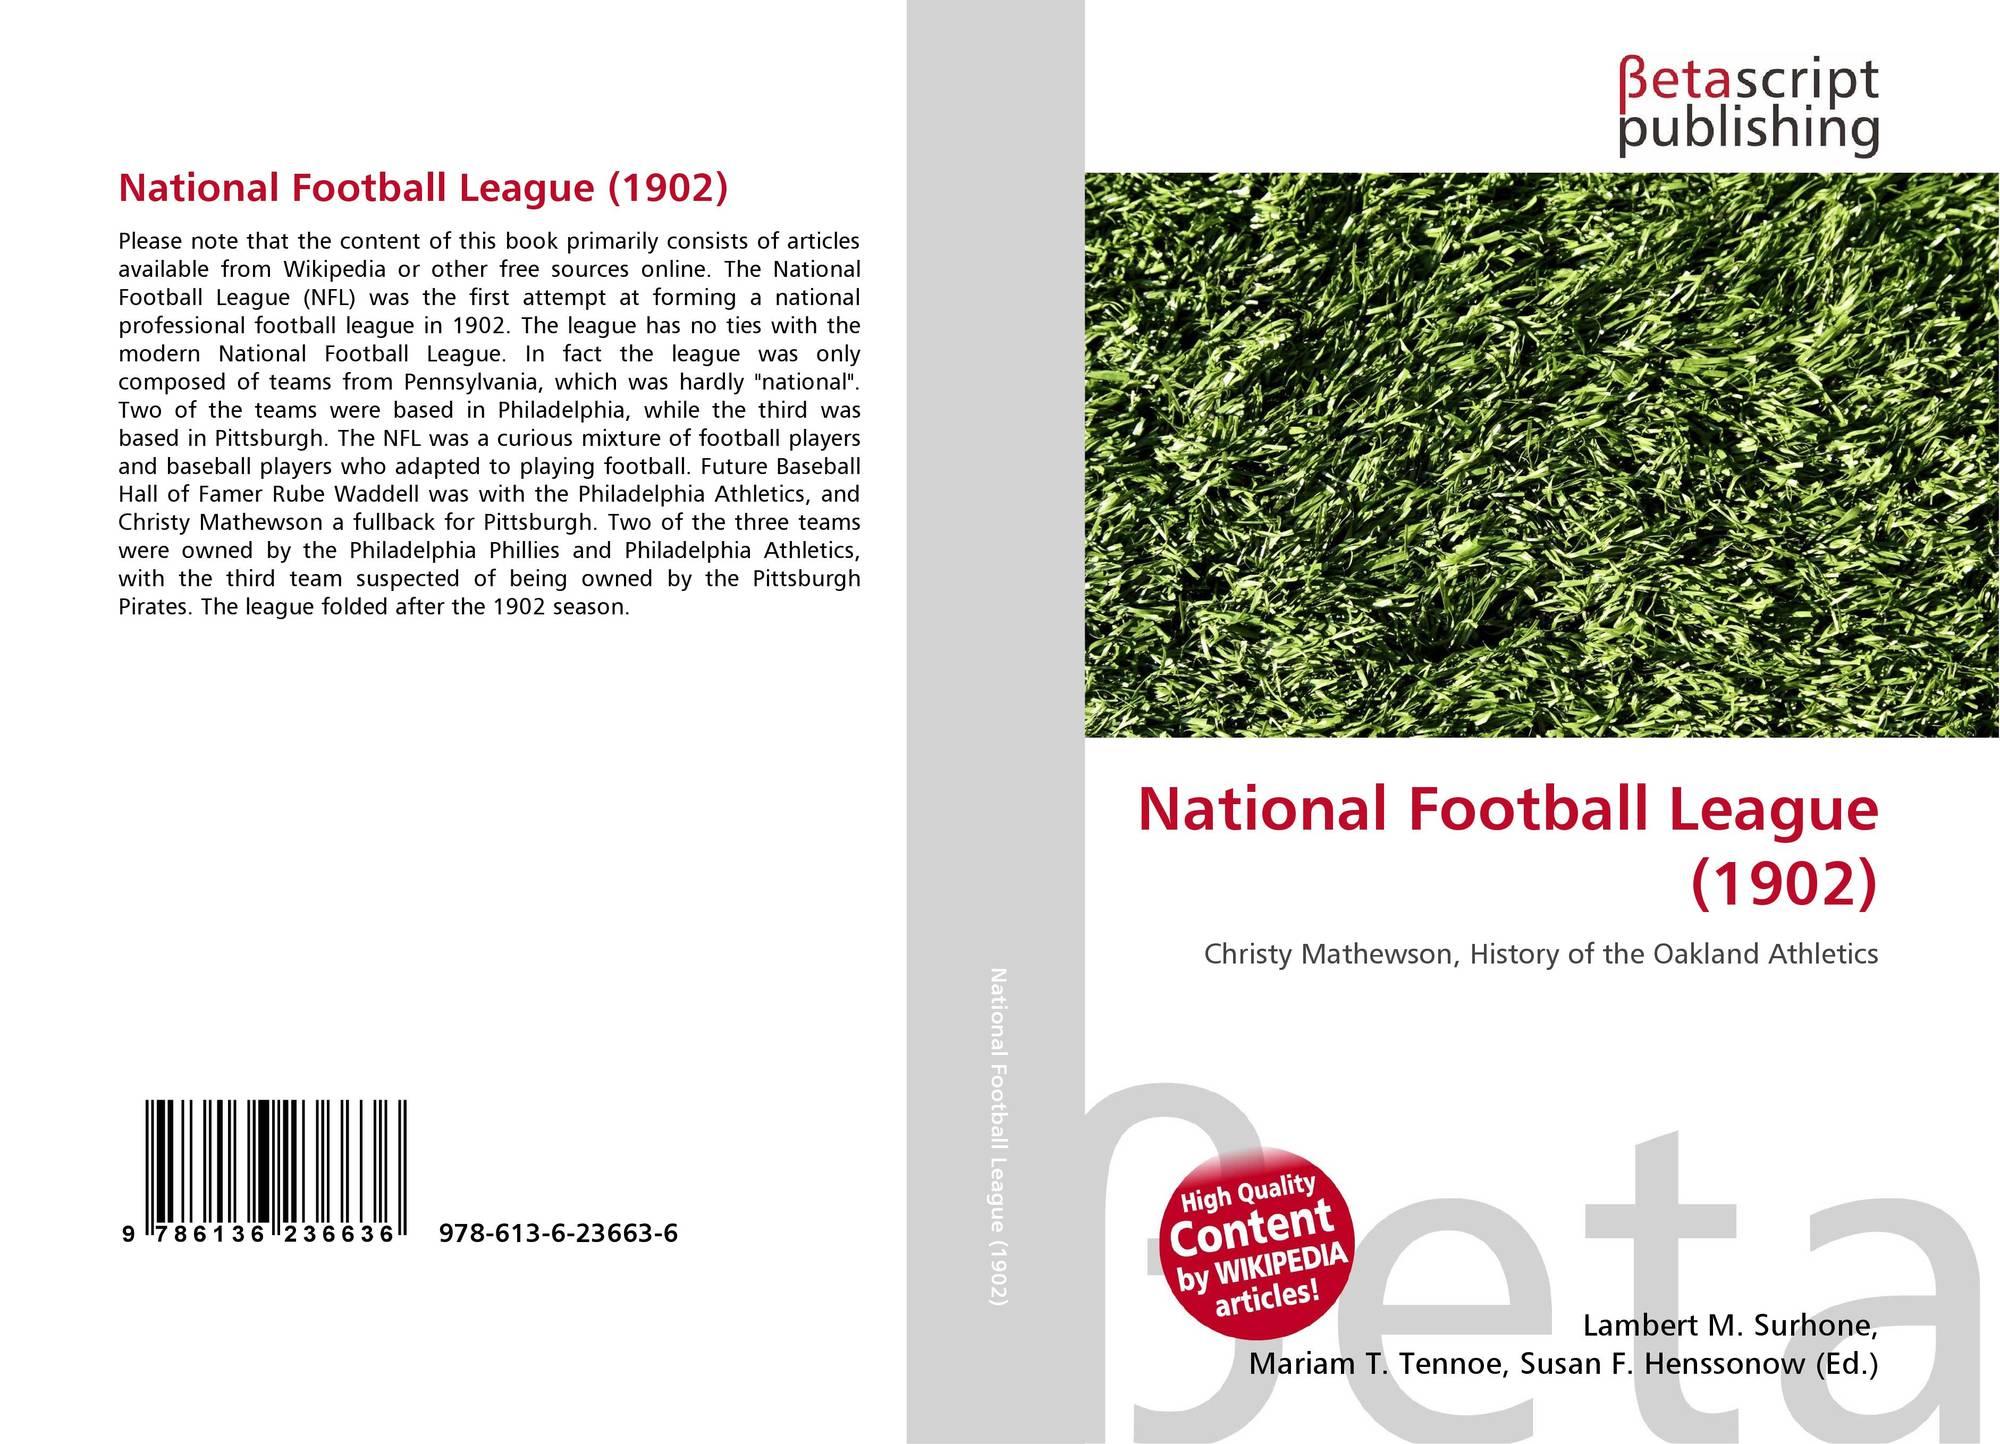 8e52e33634d Bookcover of National Football League (1902). Omni badge  9307e2201e5f762643a64561af3456be64a87707602f96b92ef18a9bbcada116